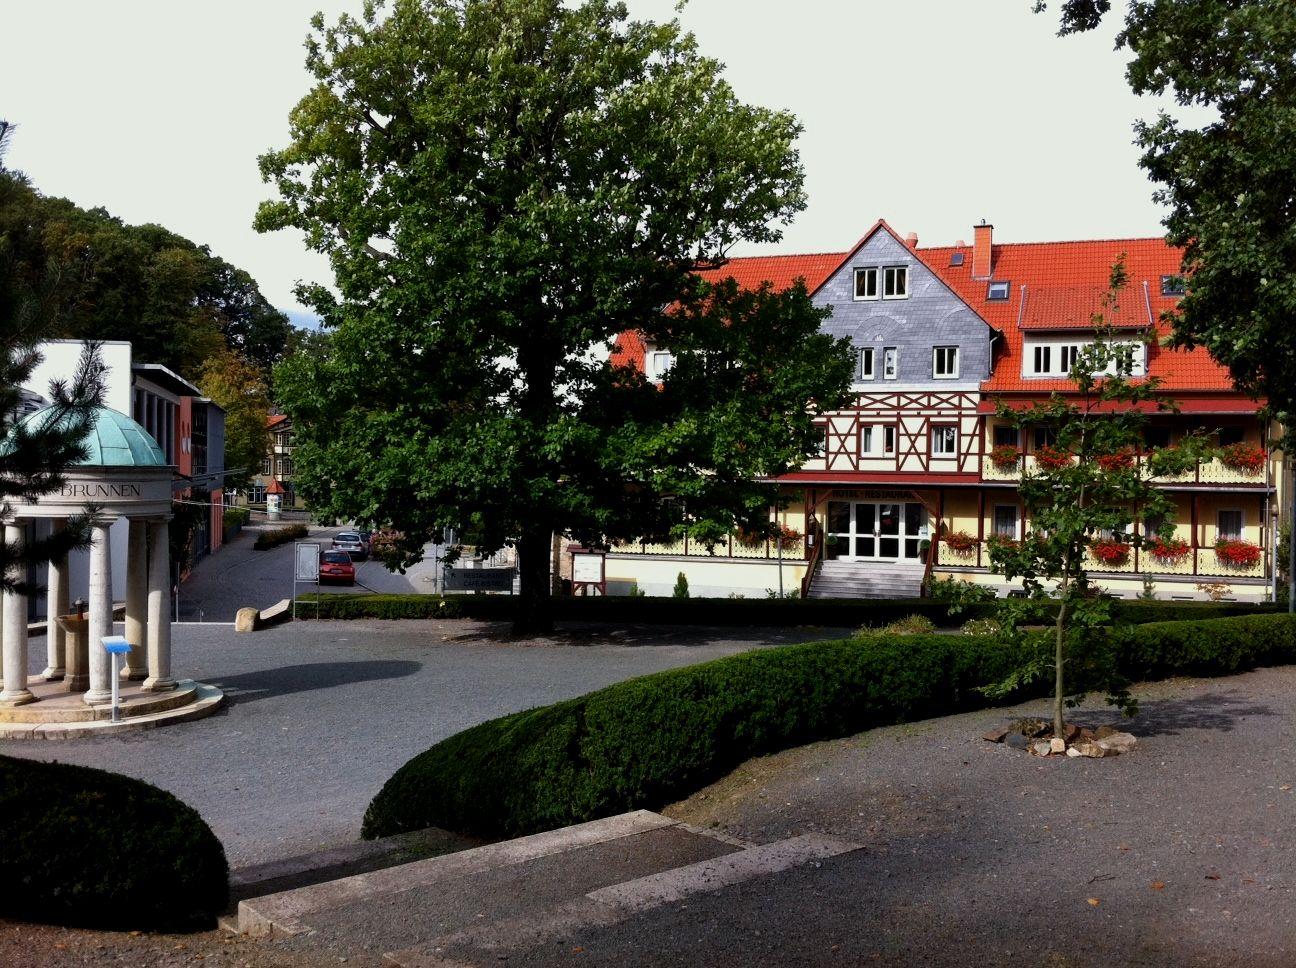 Kurhotel Bad Suderode Detlef & Kirsten Lemke